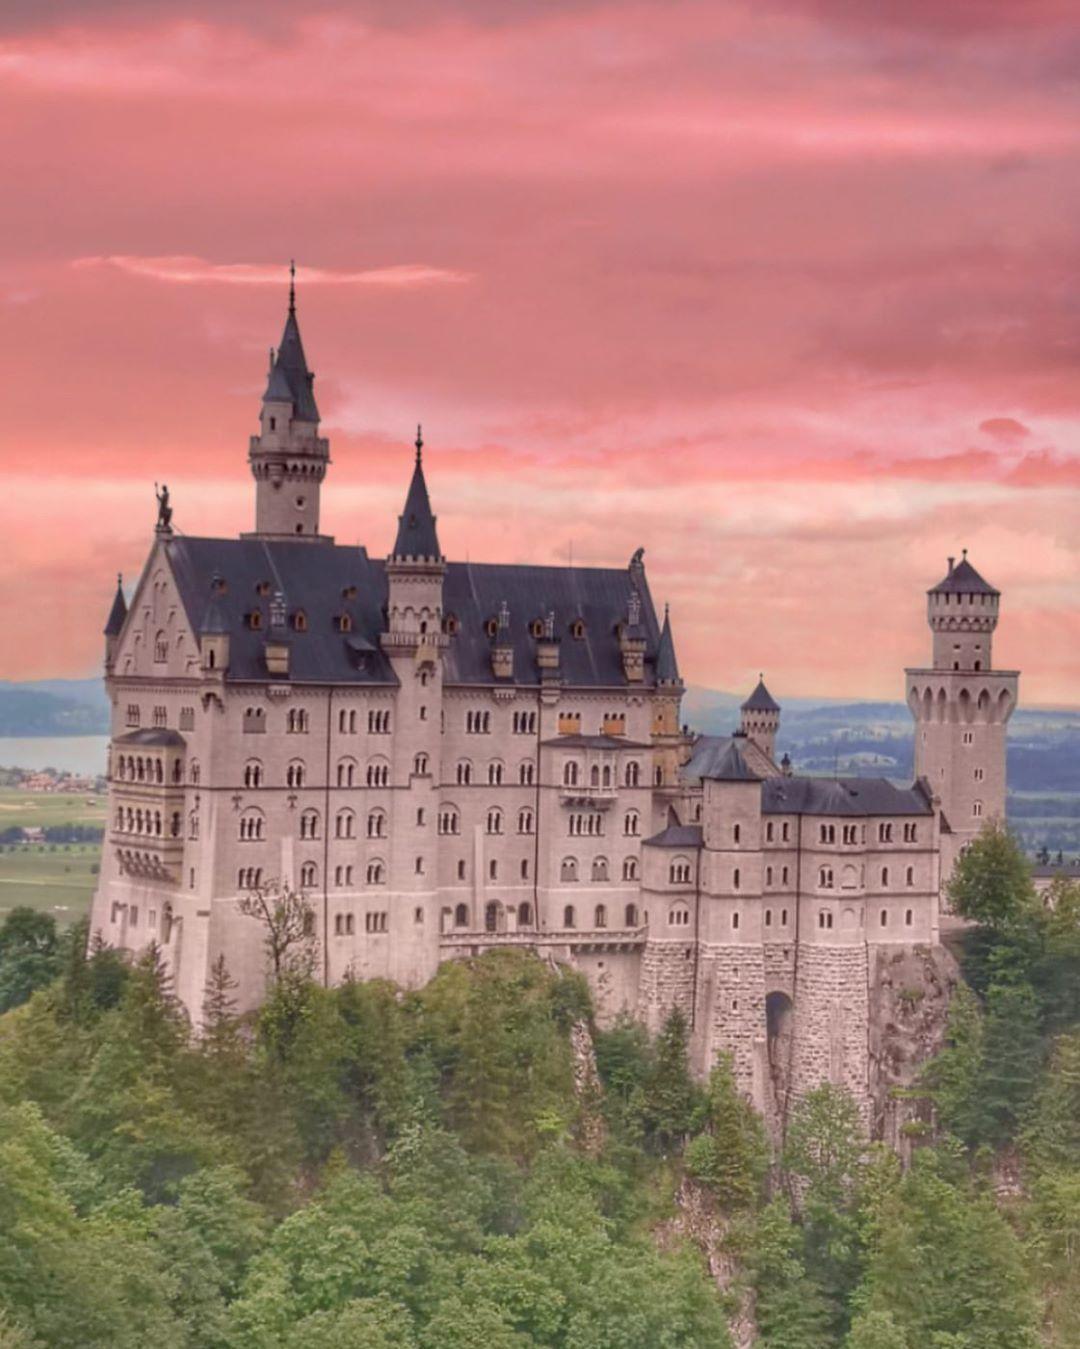 Schloss Neuschwanstein On Instagram When The Sun Goes Down Magical Germany Castles Neuschwanstein Castle Schloss Neuschwanstein